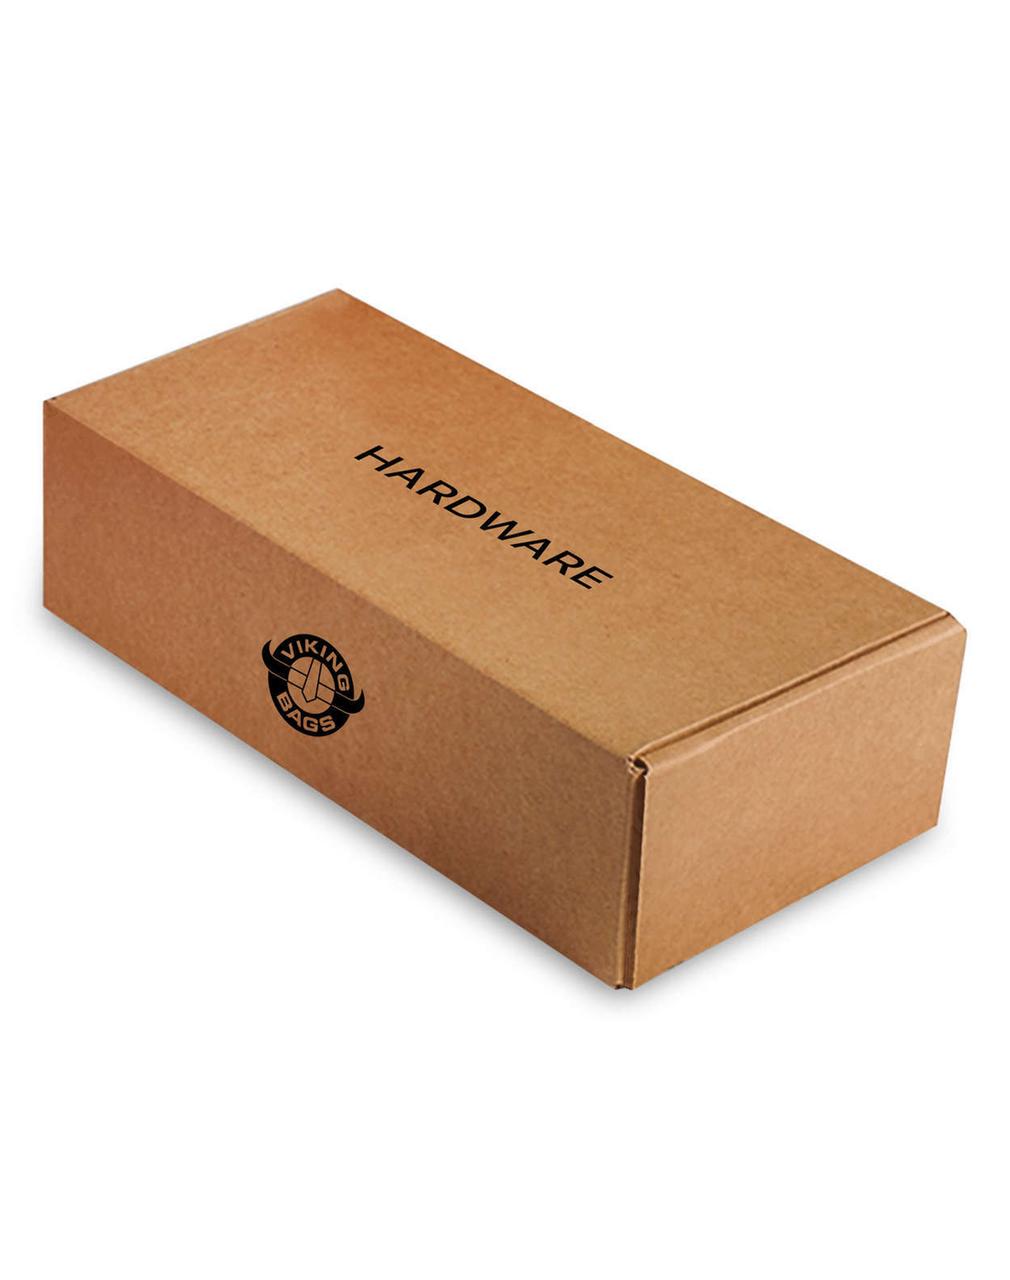 Victory Boardwalk Warrior Series Motorcycle Saddlebags Hardware Box